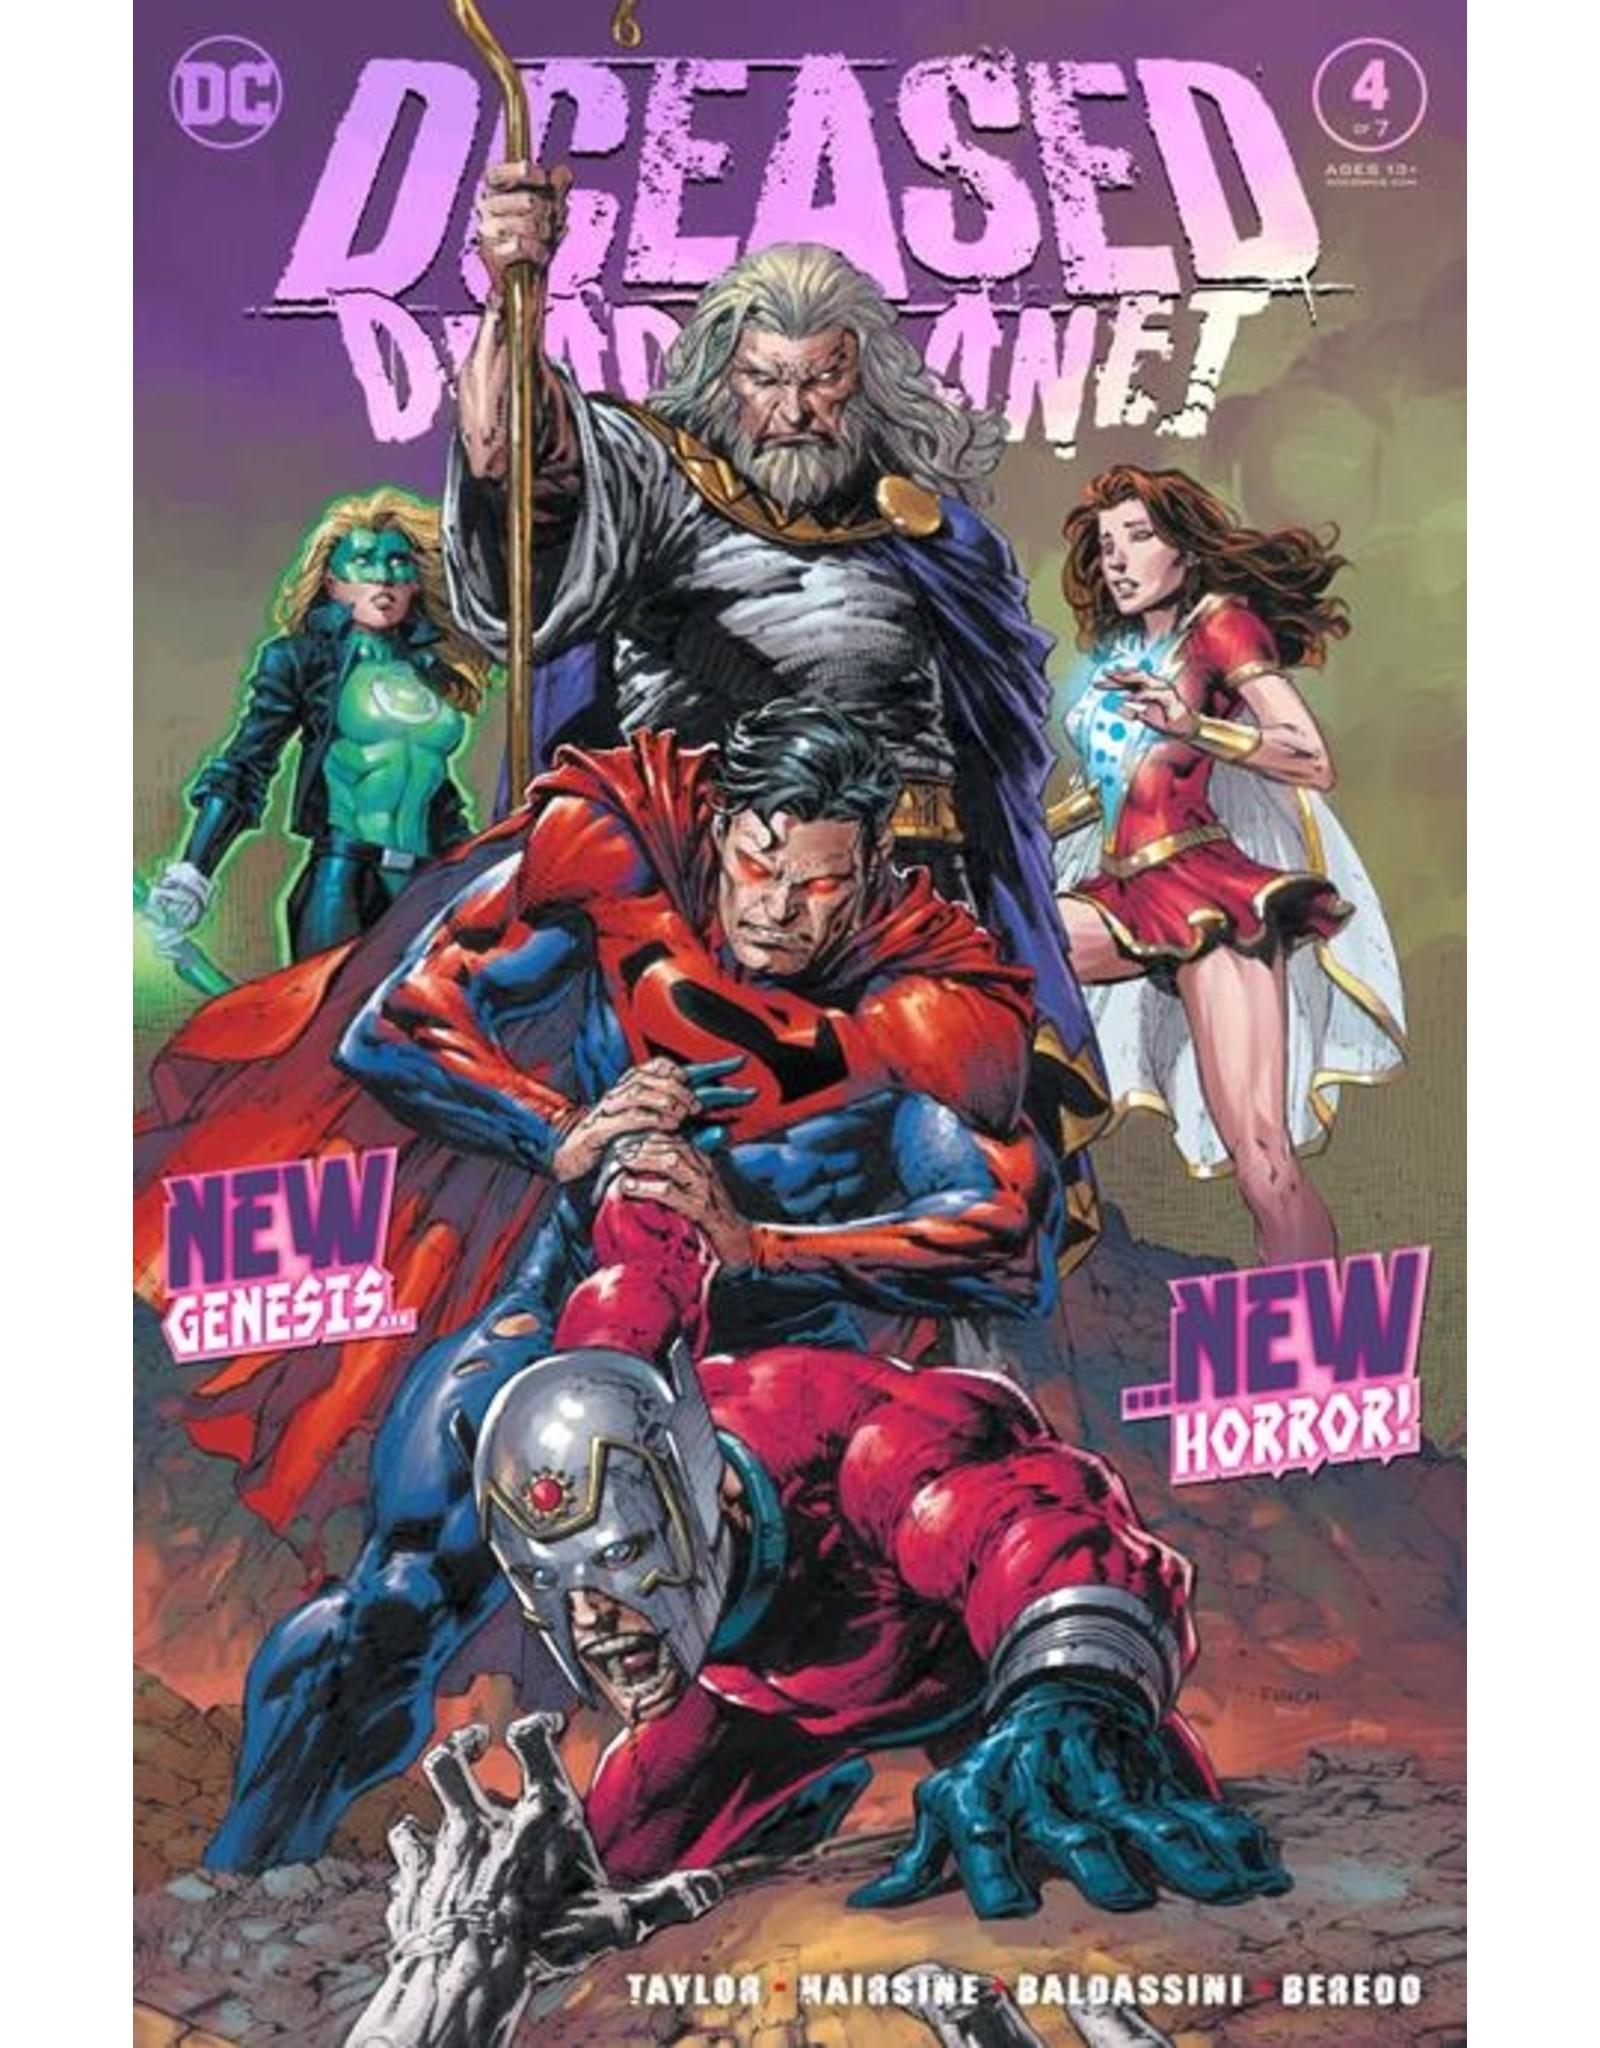 DC COMICS DCEASED DEAD PLANET #4 (OF 7) CVR A DAVID FINCH